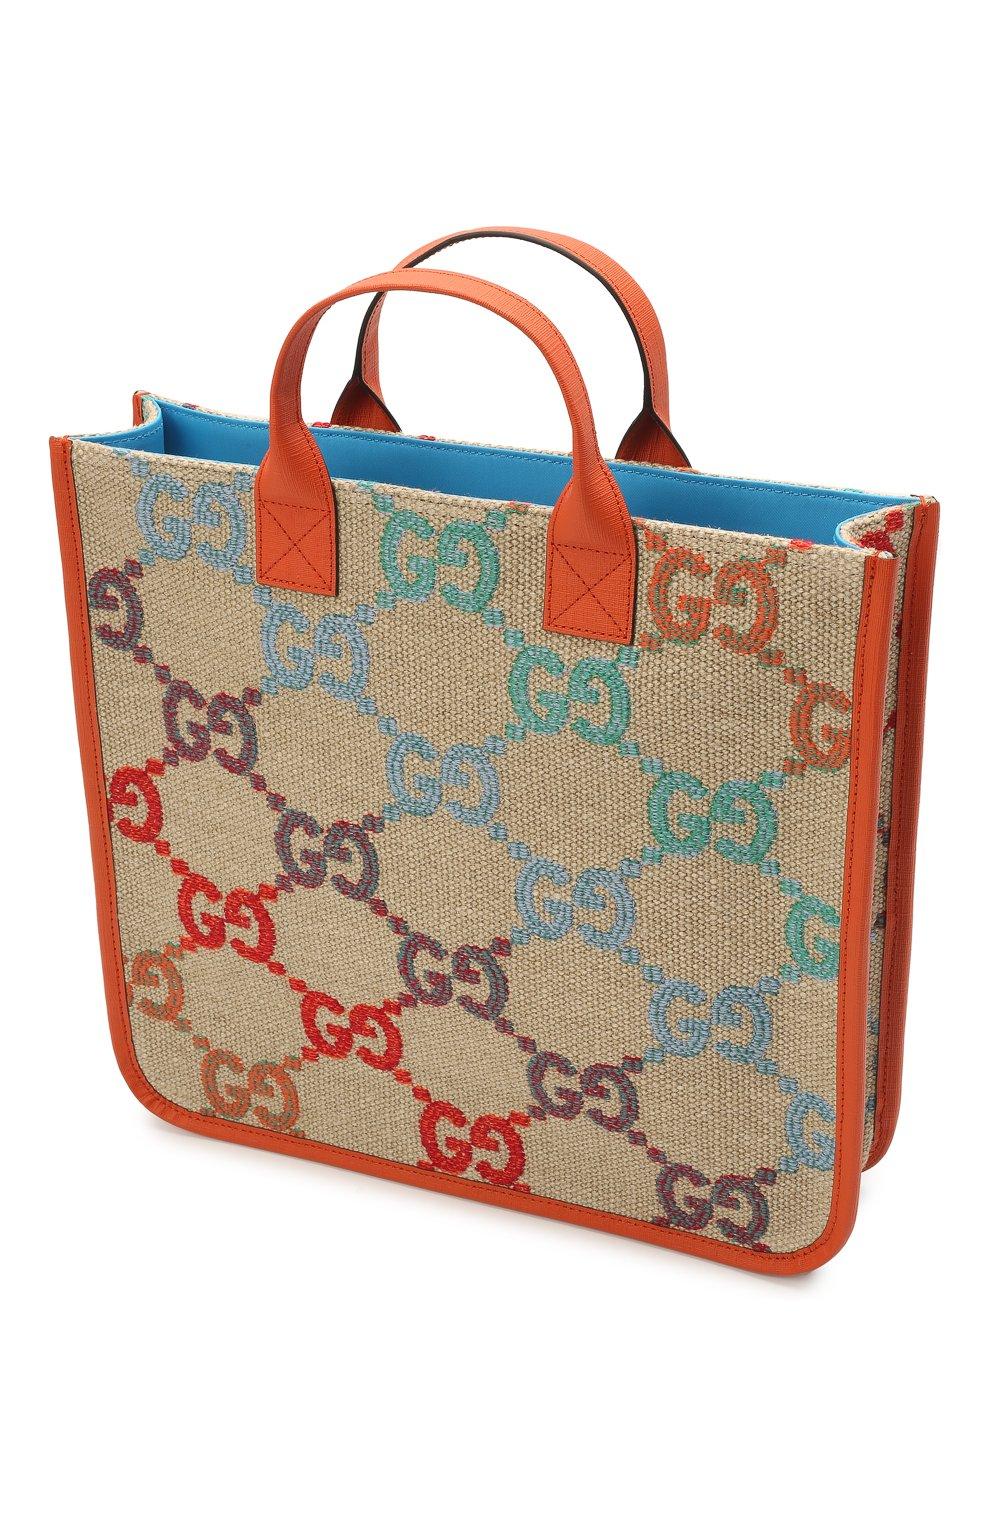 Детская сумка GUCCI разноцветного цвета, арт. 550763/2KMA0 | Фото 3 (Материал: Текстиль)